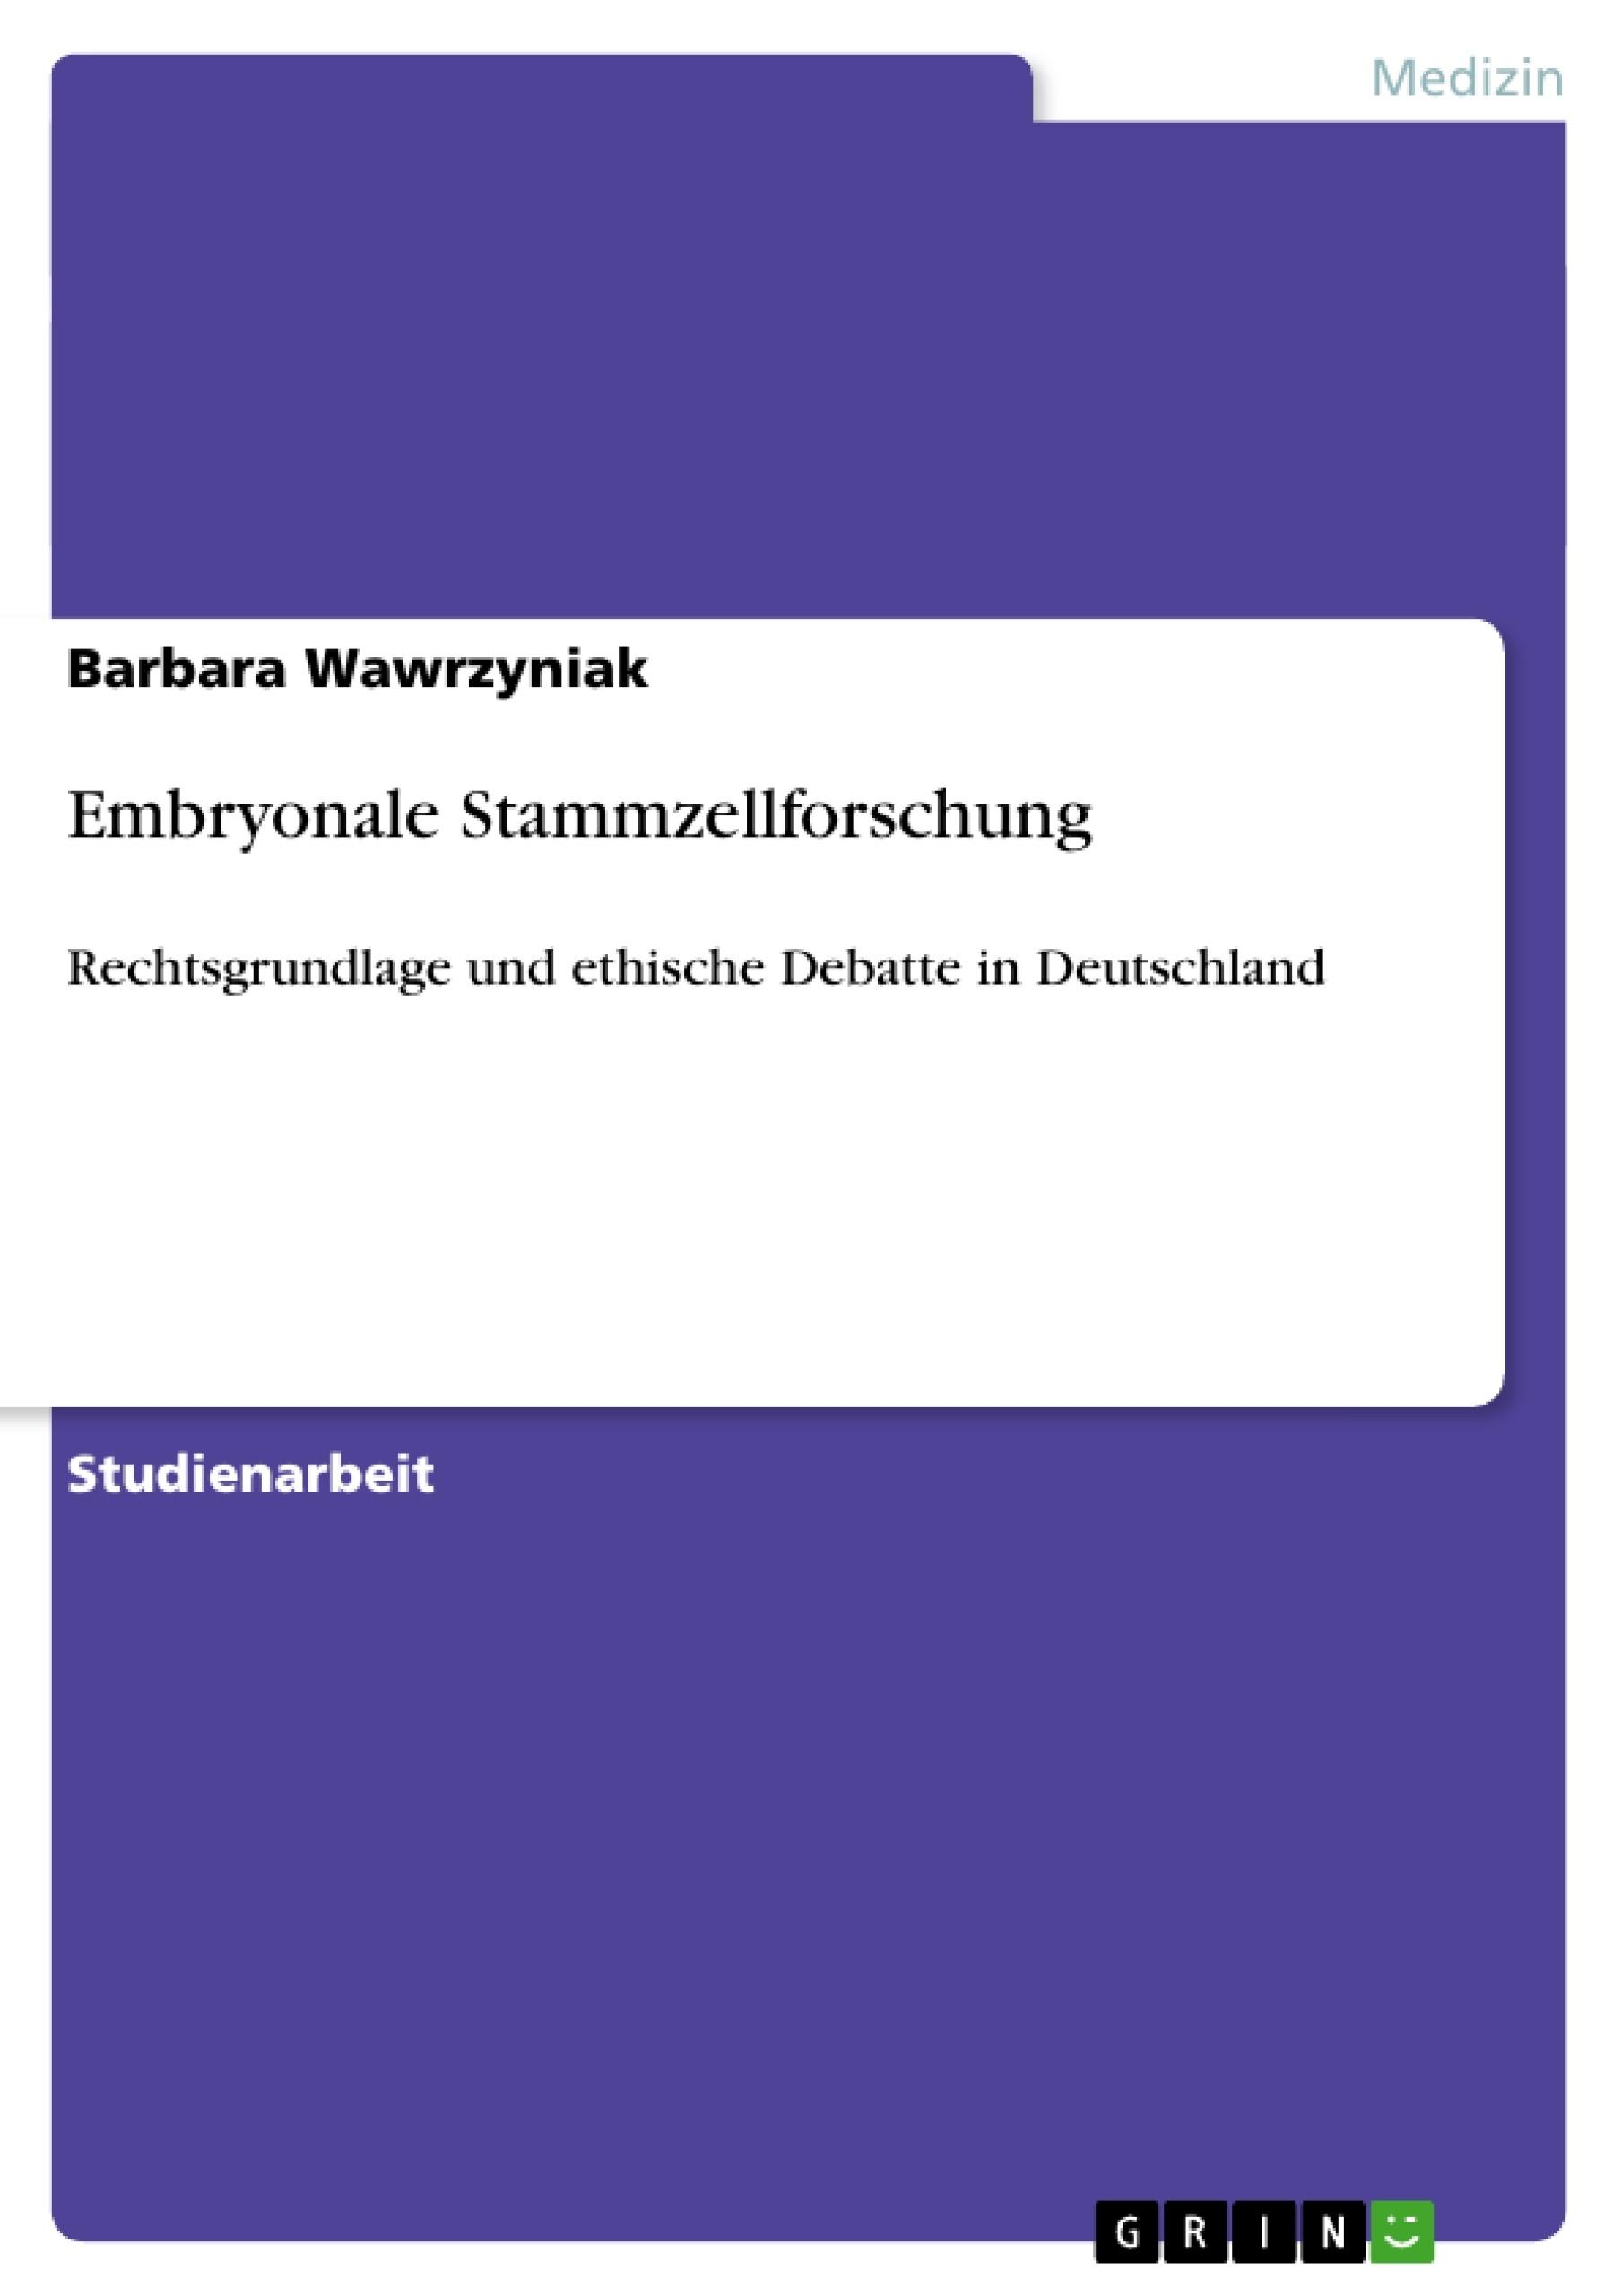 Titel: Embryonale Stammzellforschung